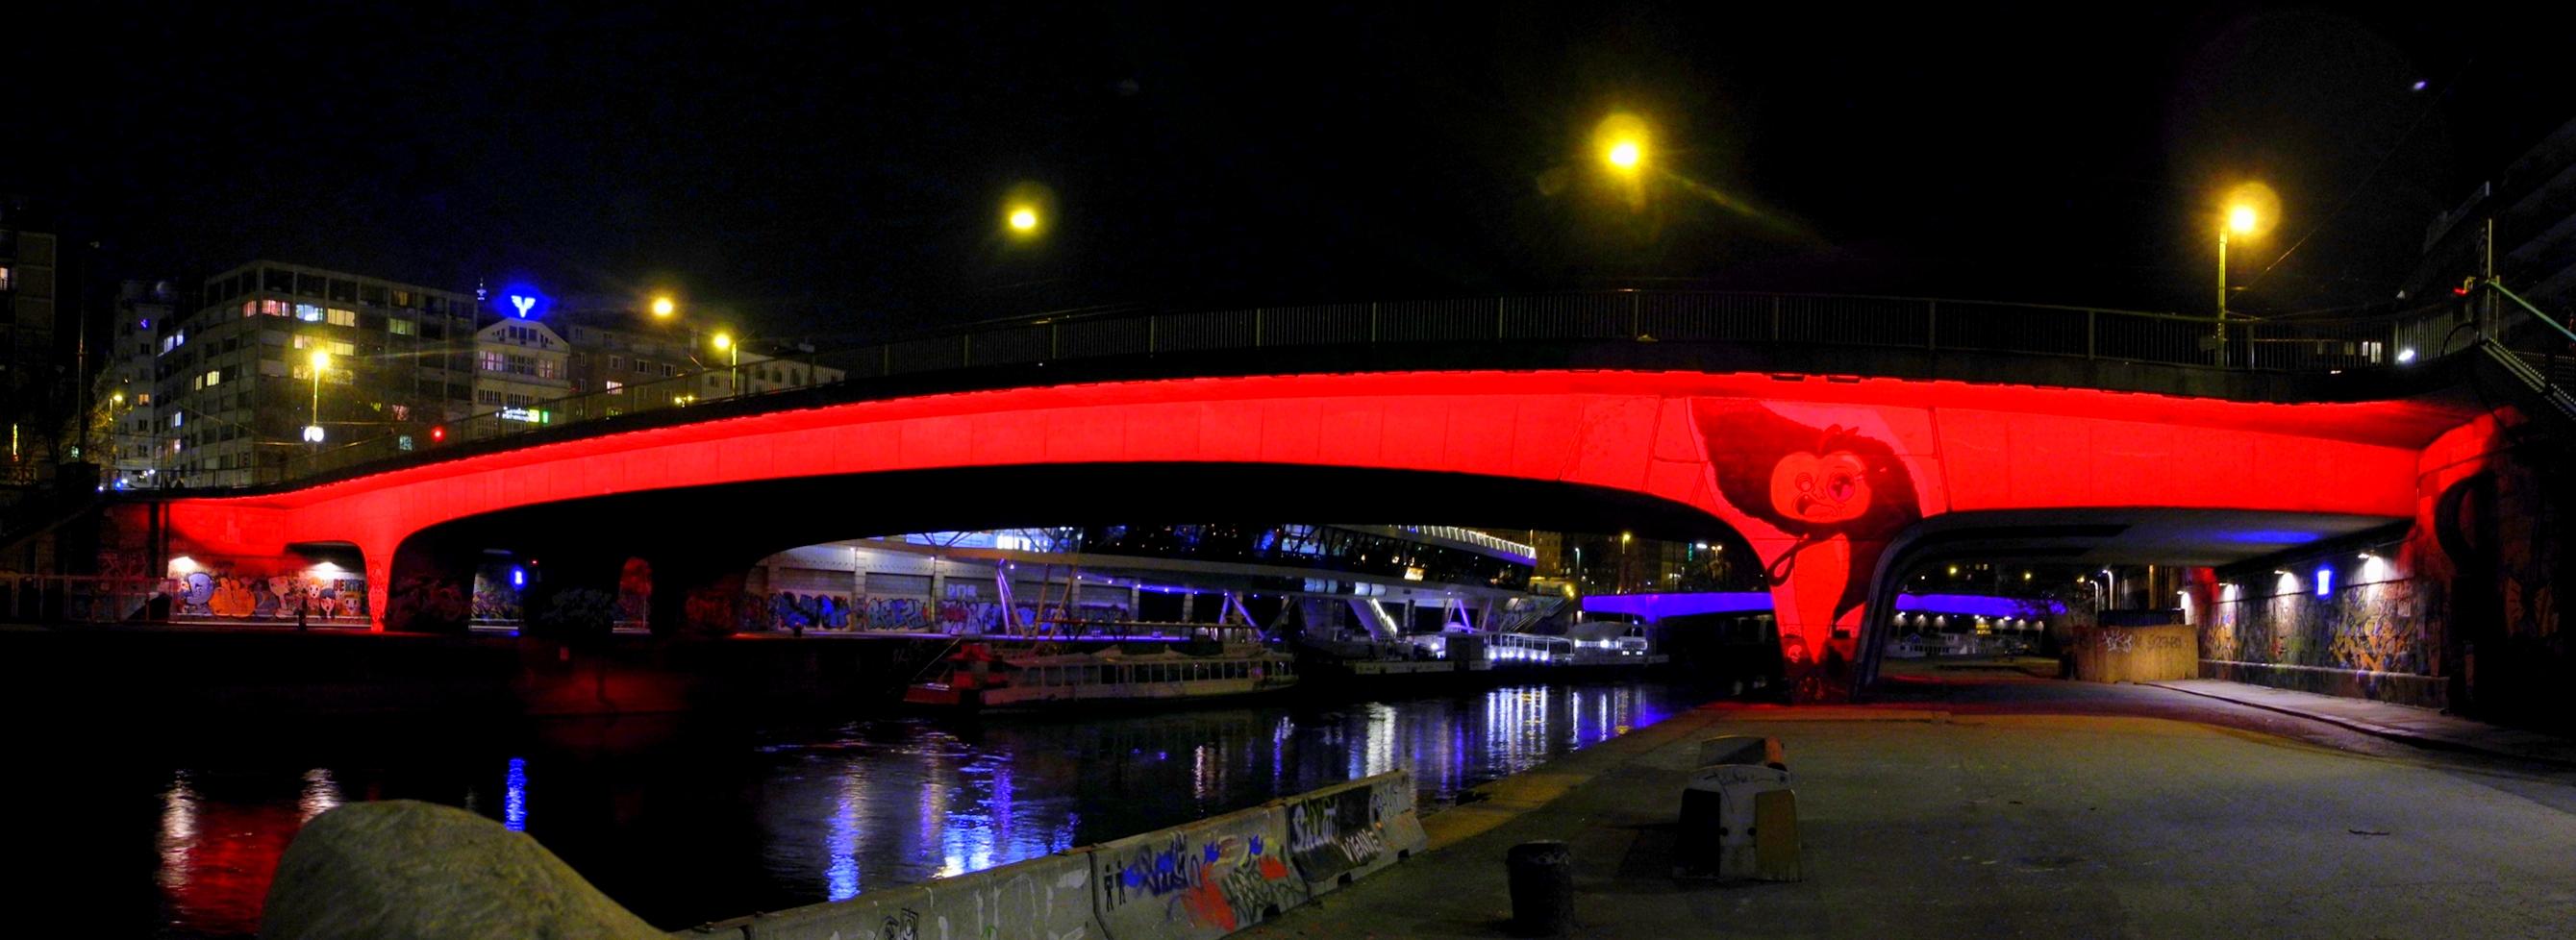 Schwedenbrücke Rot - panoramio.jpg